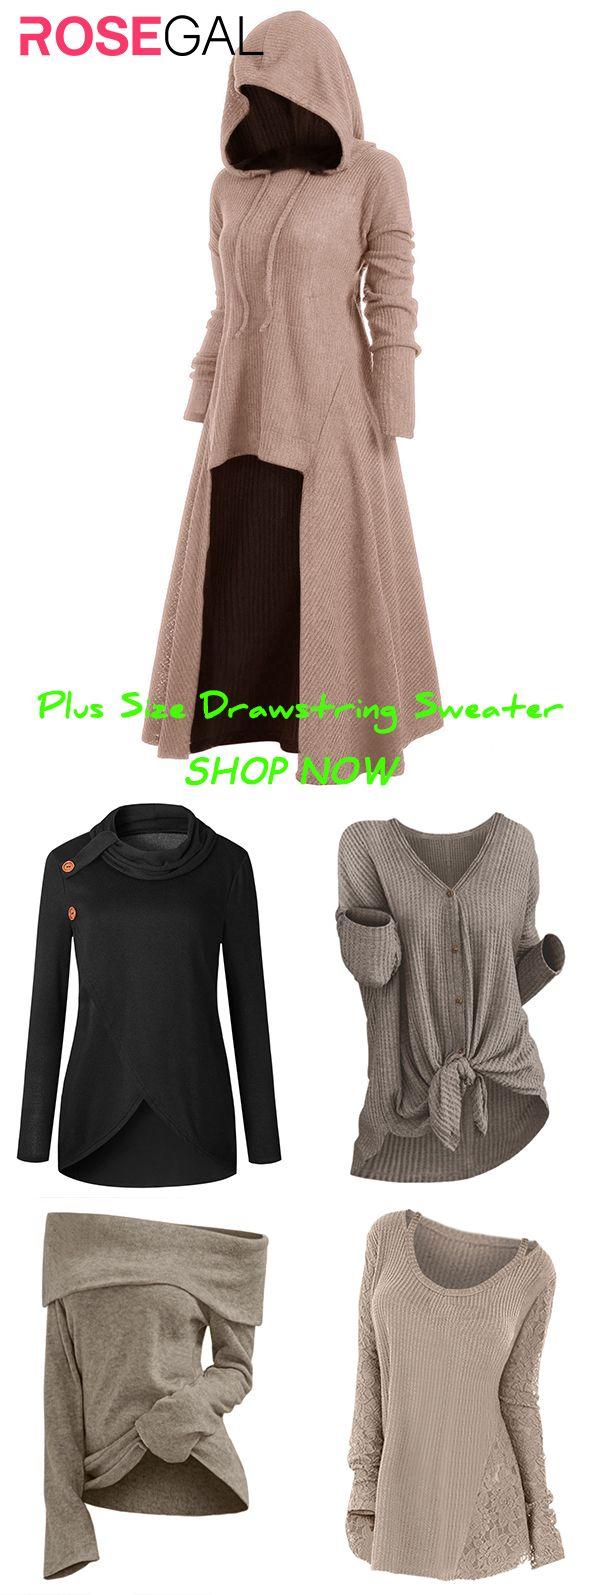 Rosegal Plus Size Drawstring  Sweater ideas 11